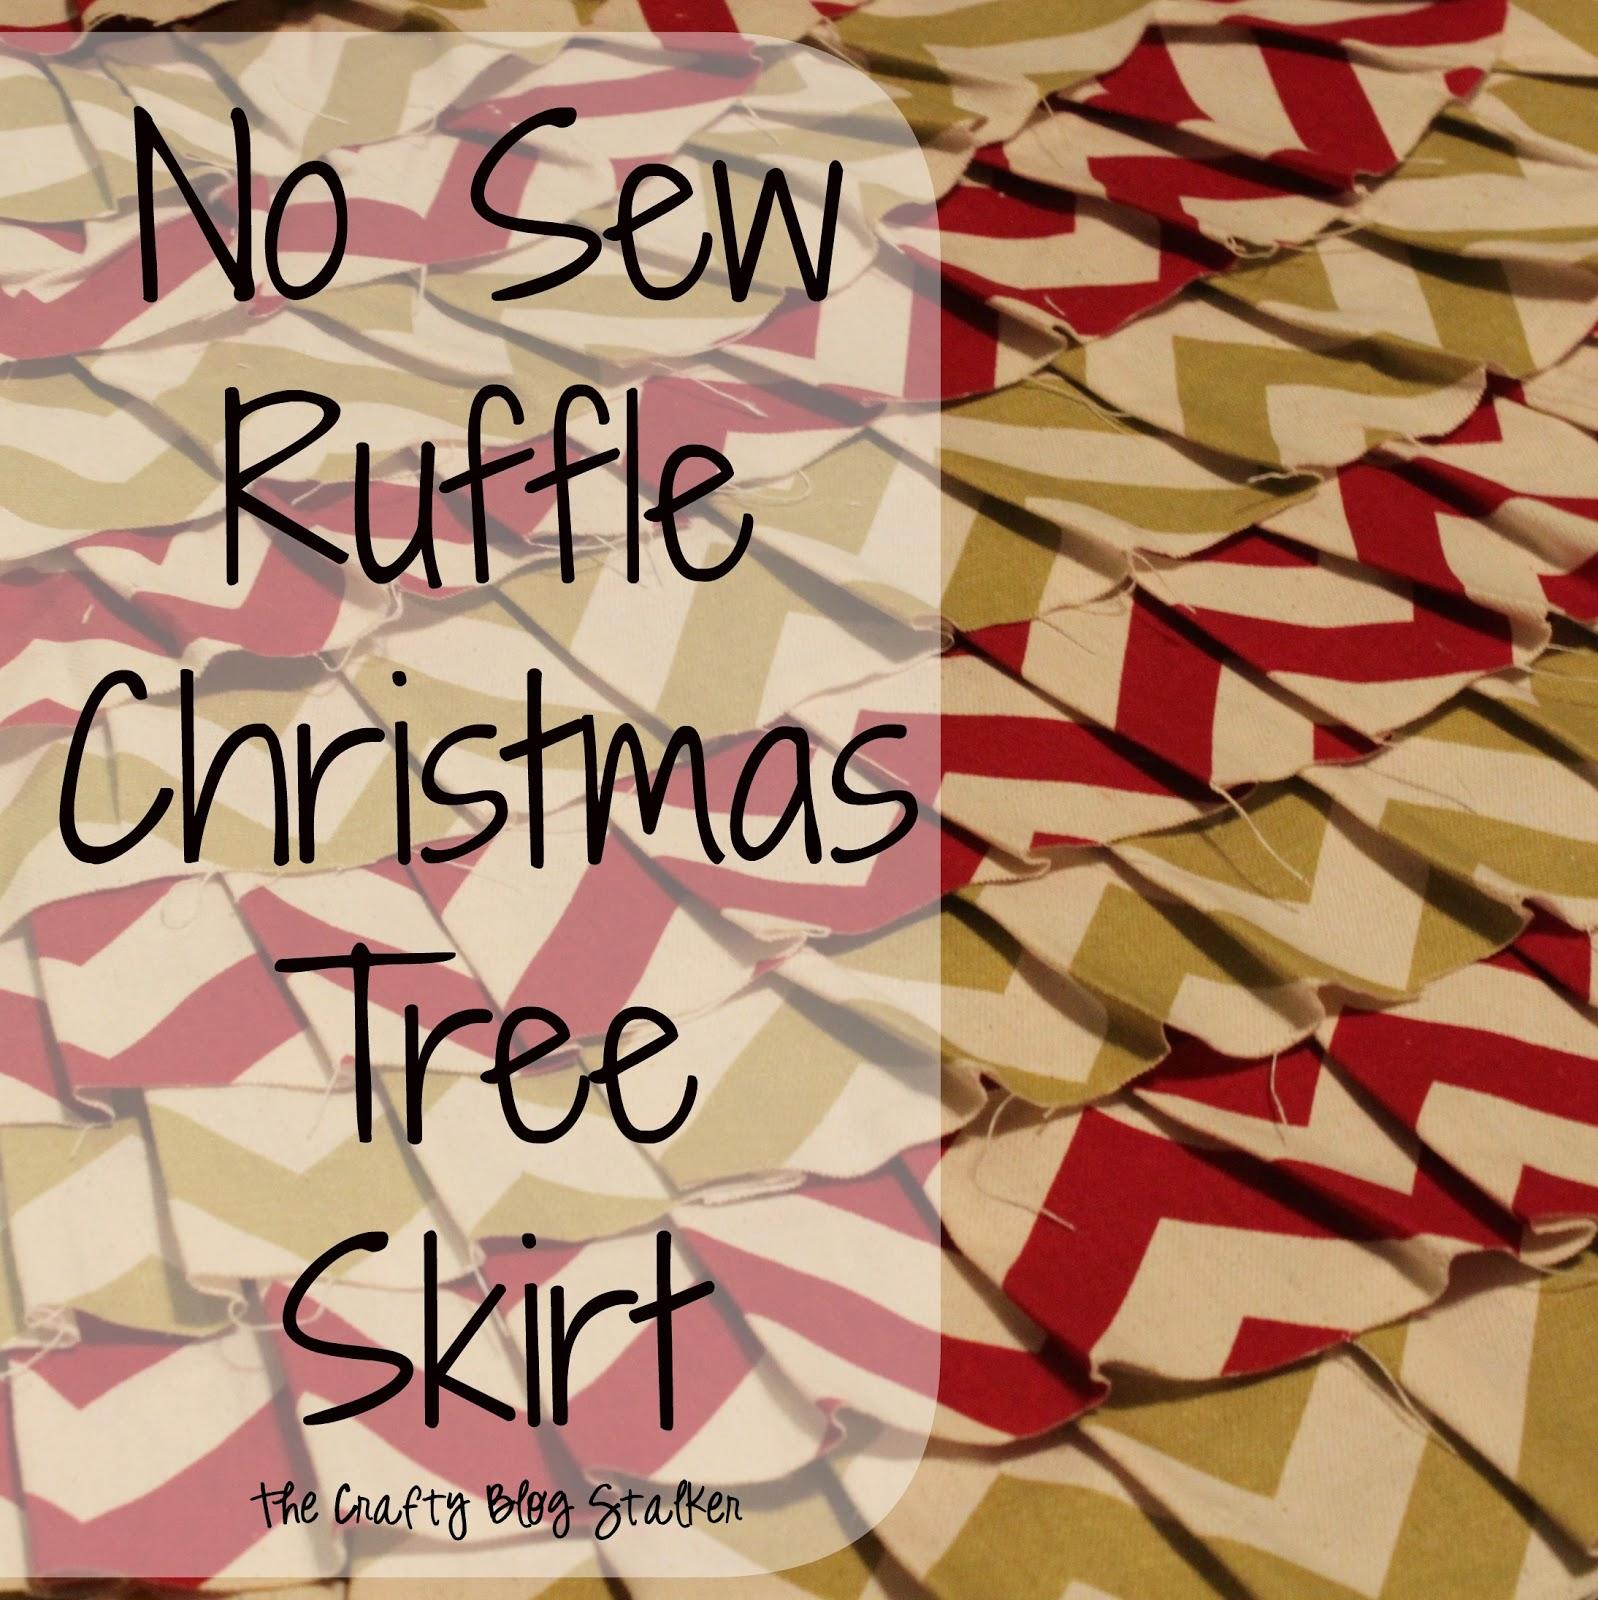 No Sew Ruffle Christmas Tree Skirt - The Crafty Blog Stalker